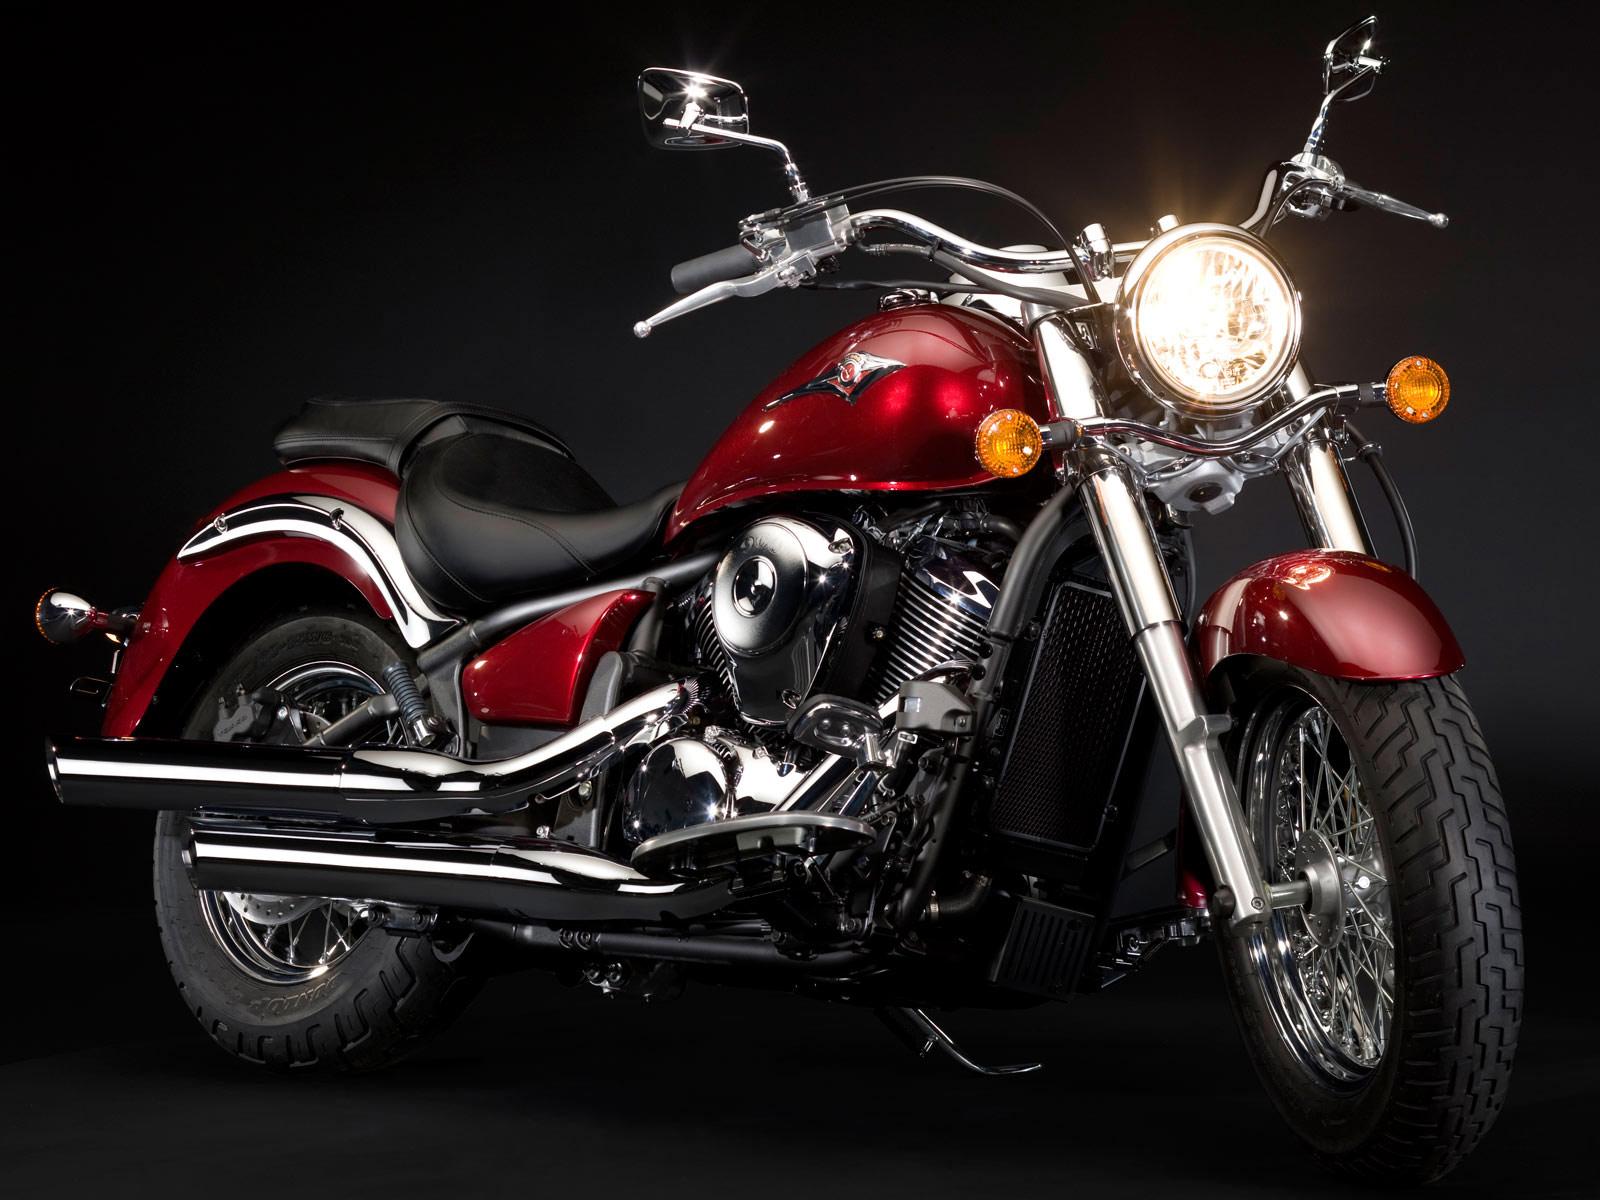 Luxury Motorcycle Hd Wallpapers: KAWASAKI Desktop Wallpaper 2009 VN 900 Classic